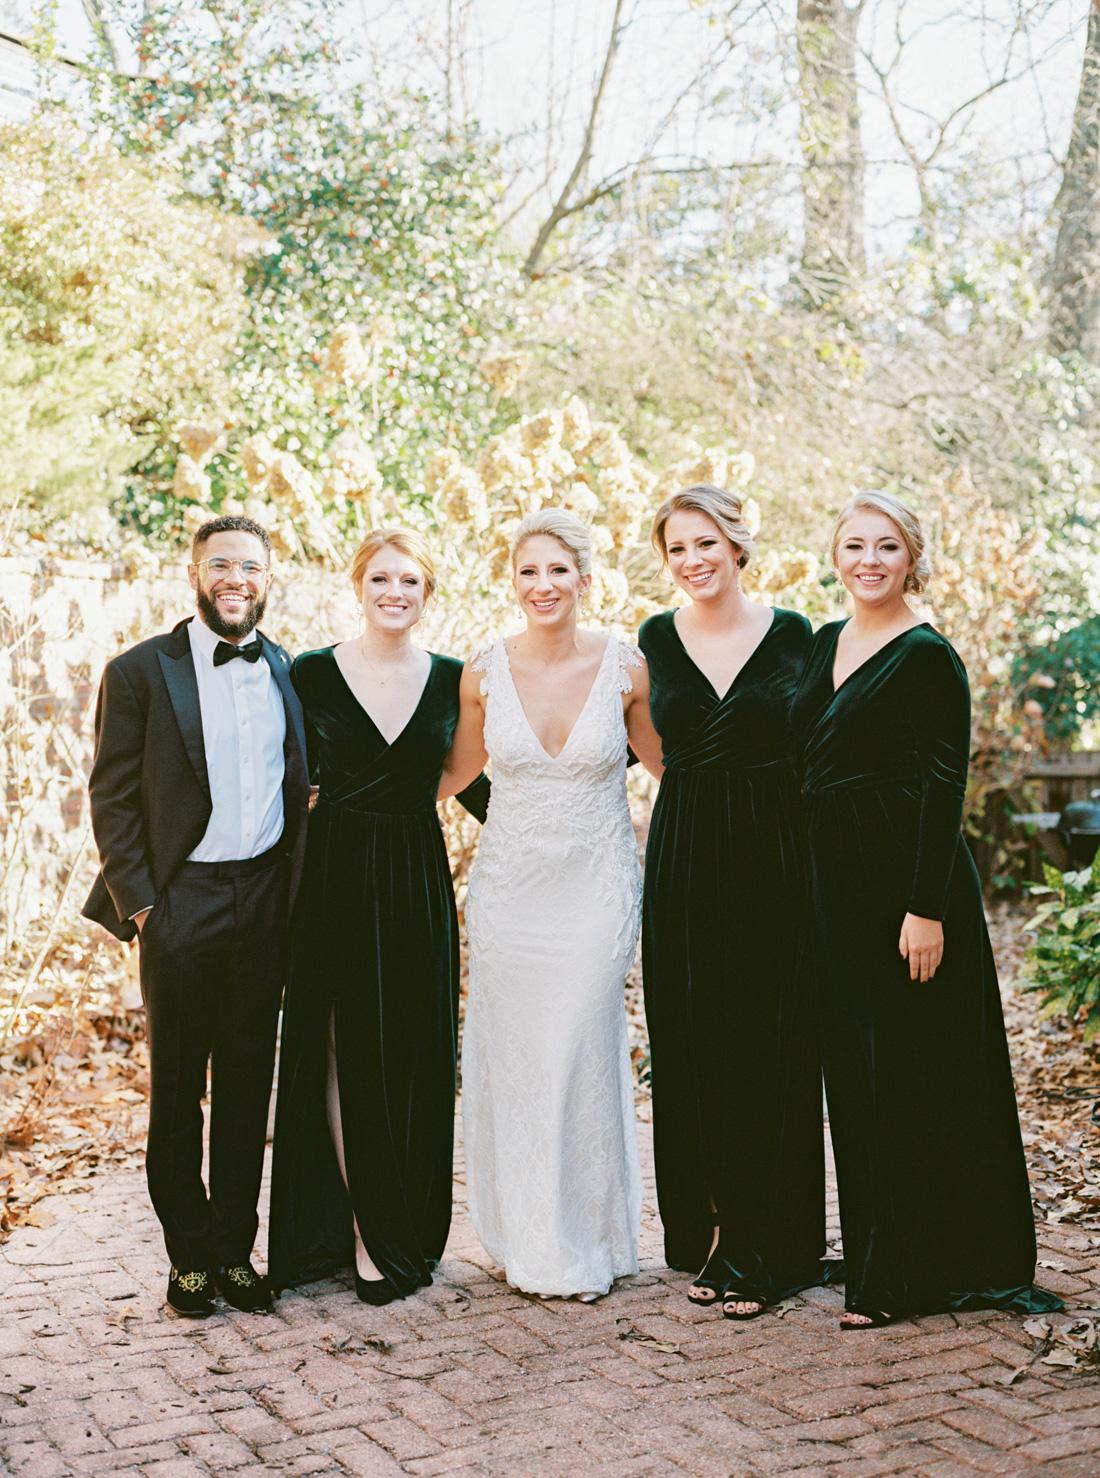 velvet-green-bridal-party-bridesmaids